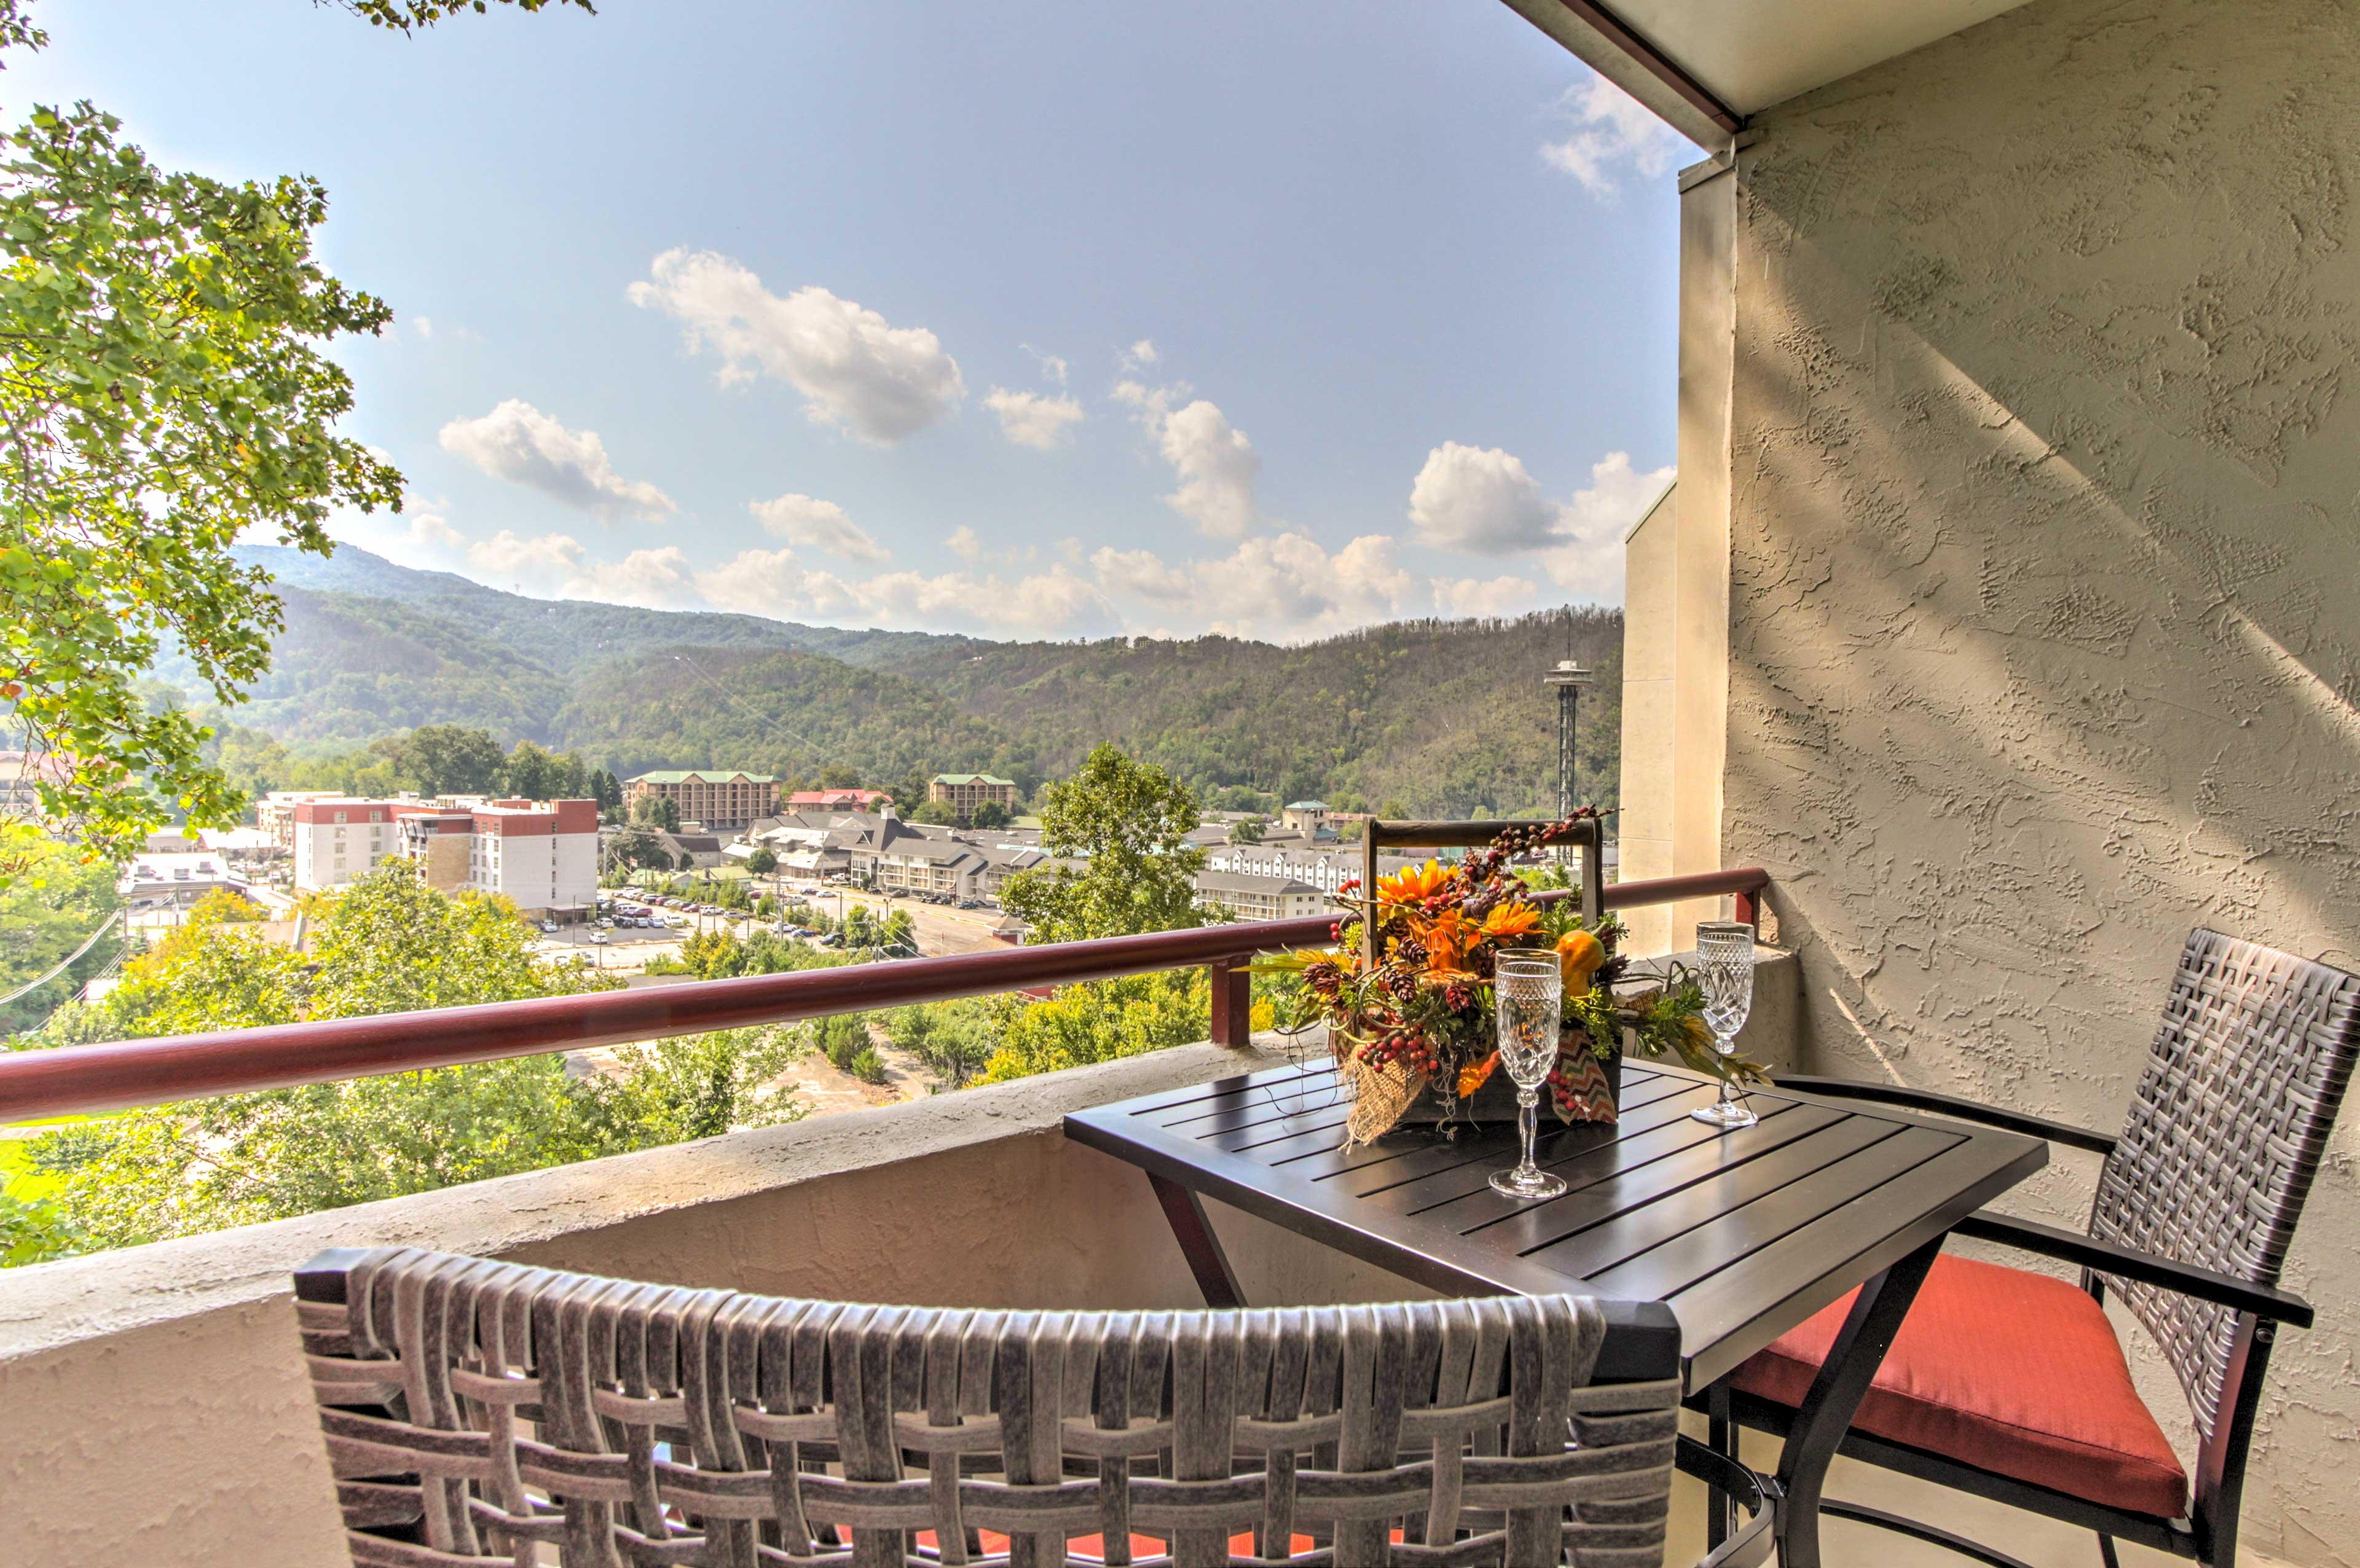 Enjoy breathtaking views of Gatlinburg, the Space Needle, and Smoky Mountains!